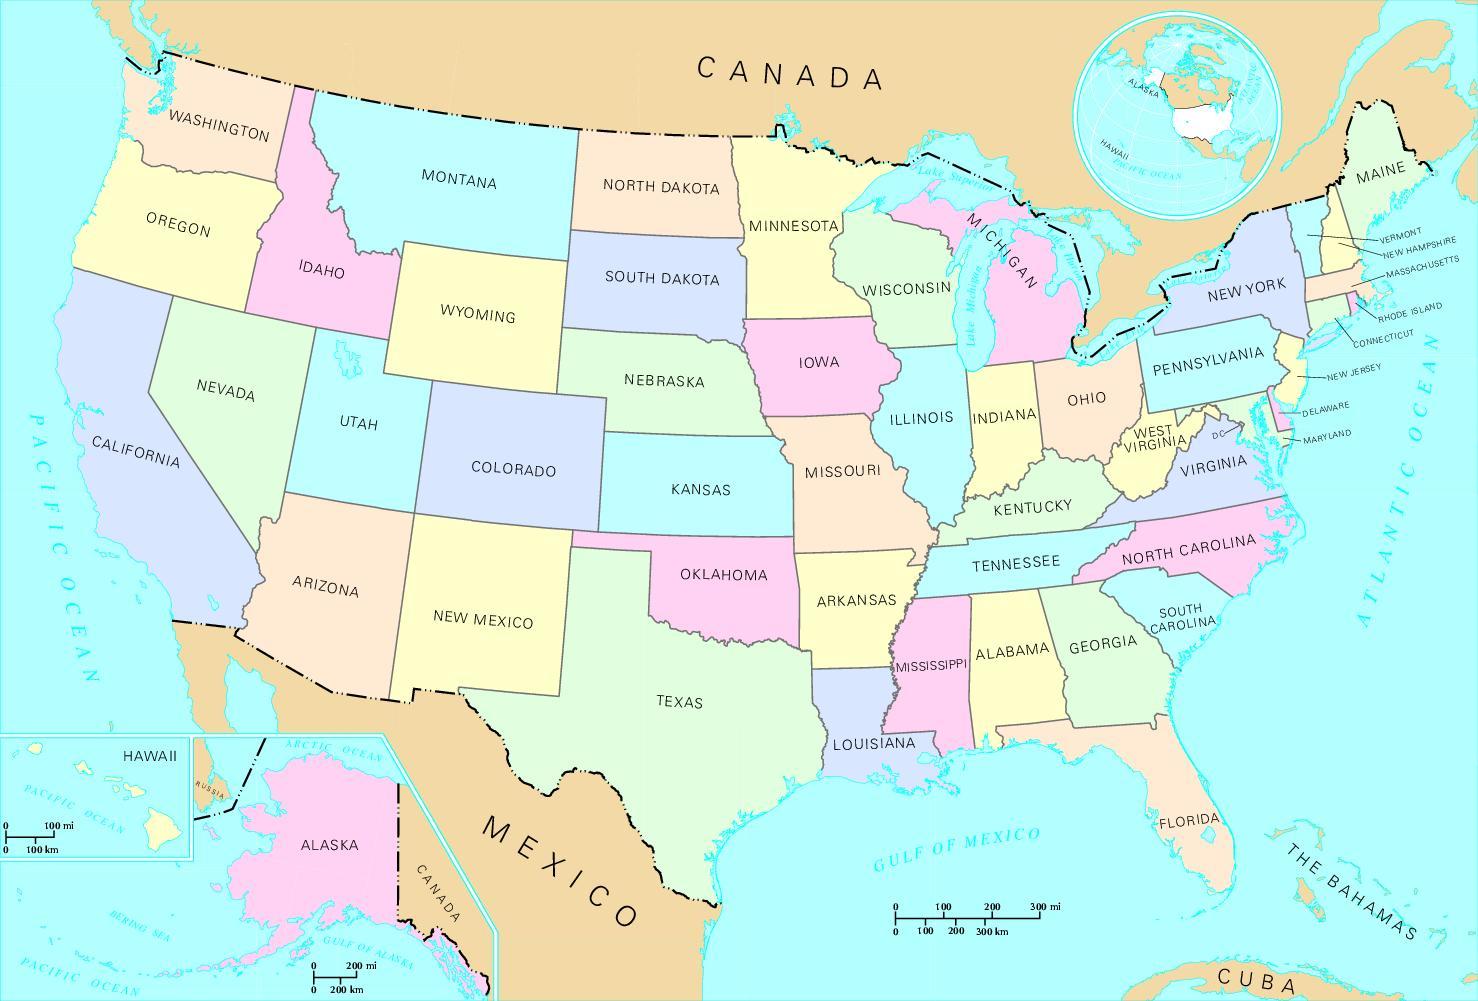 Amerika Karte Staaten.Usa Karte Staaten Usa Landkarte Staat Nord Amerika Amerika